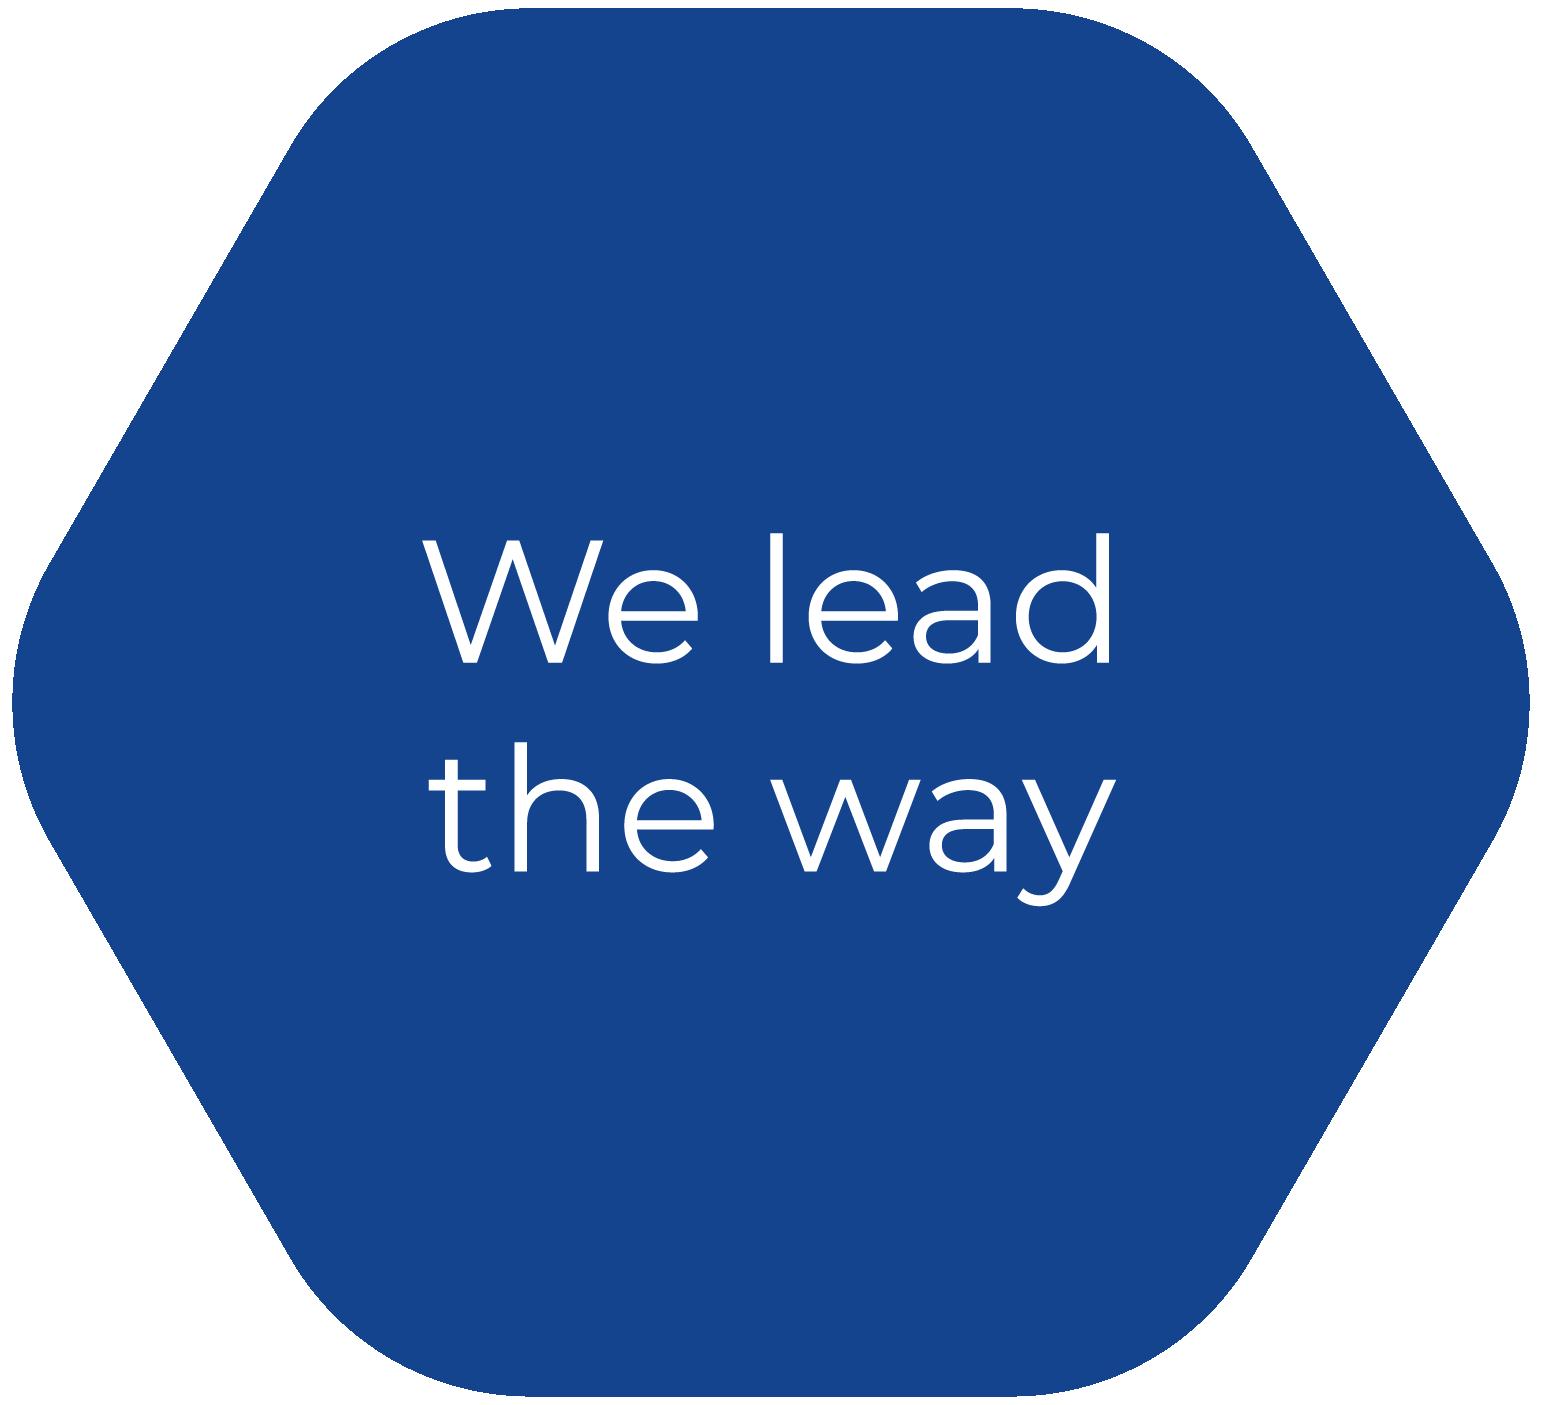 We lead the way